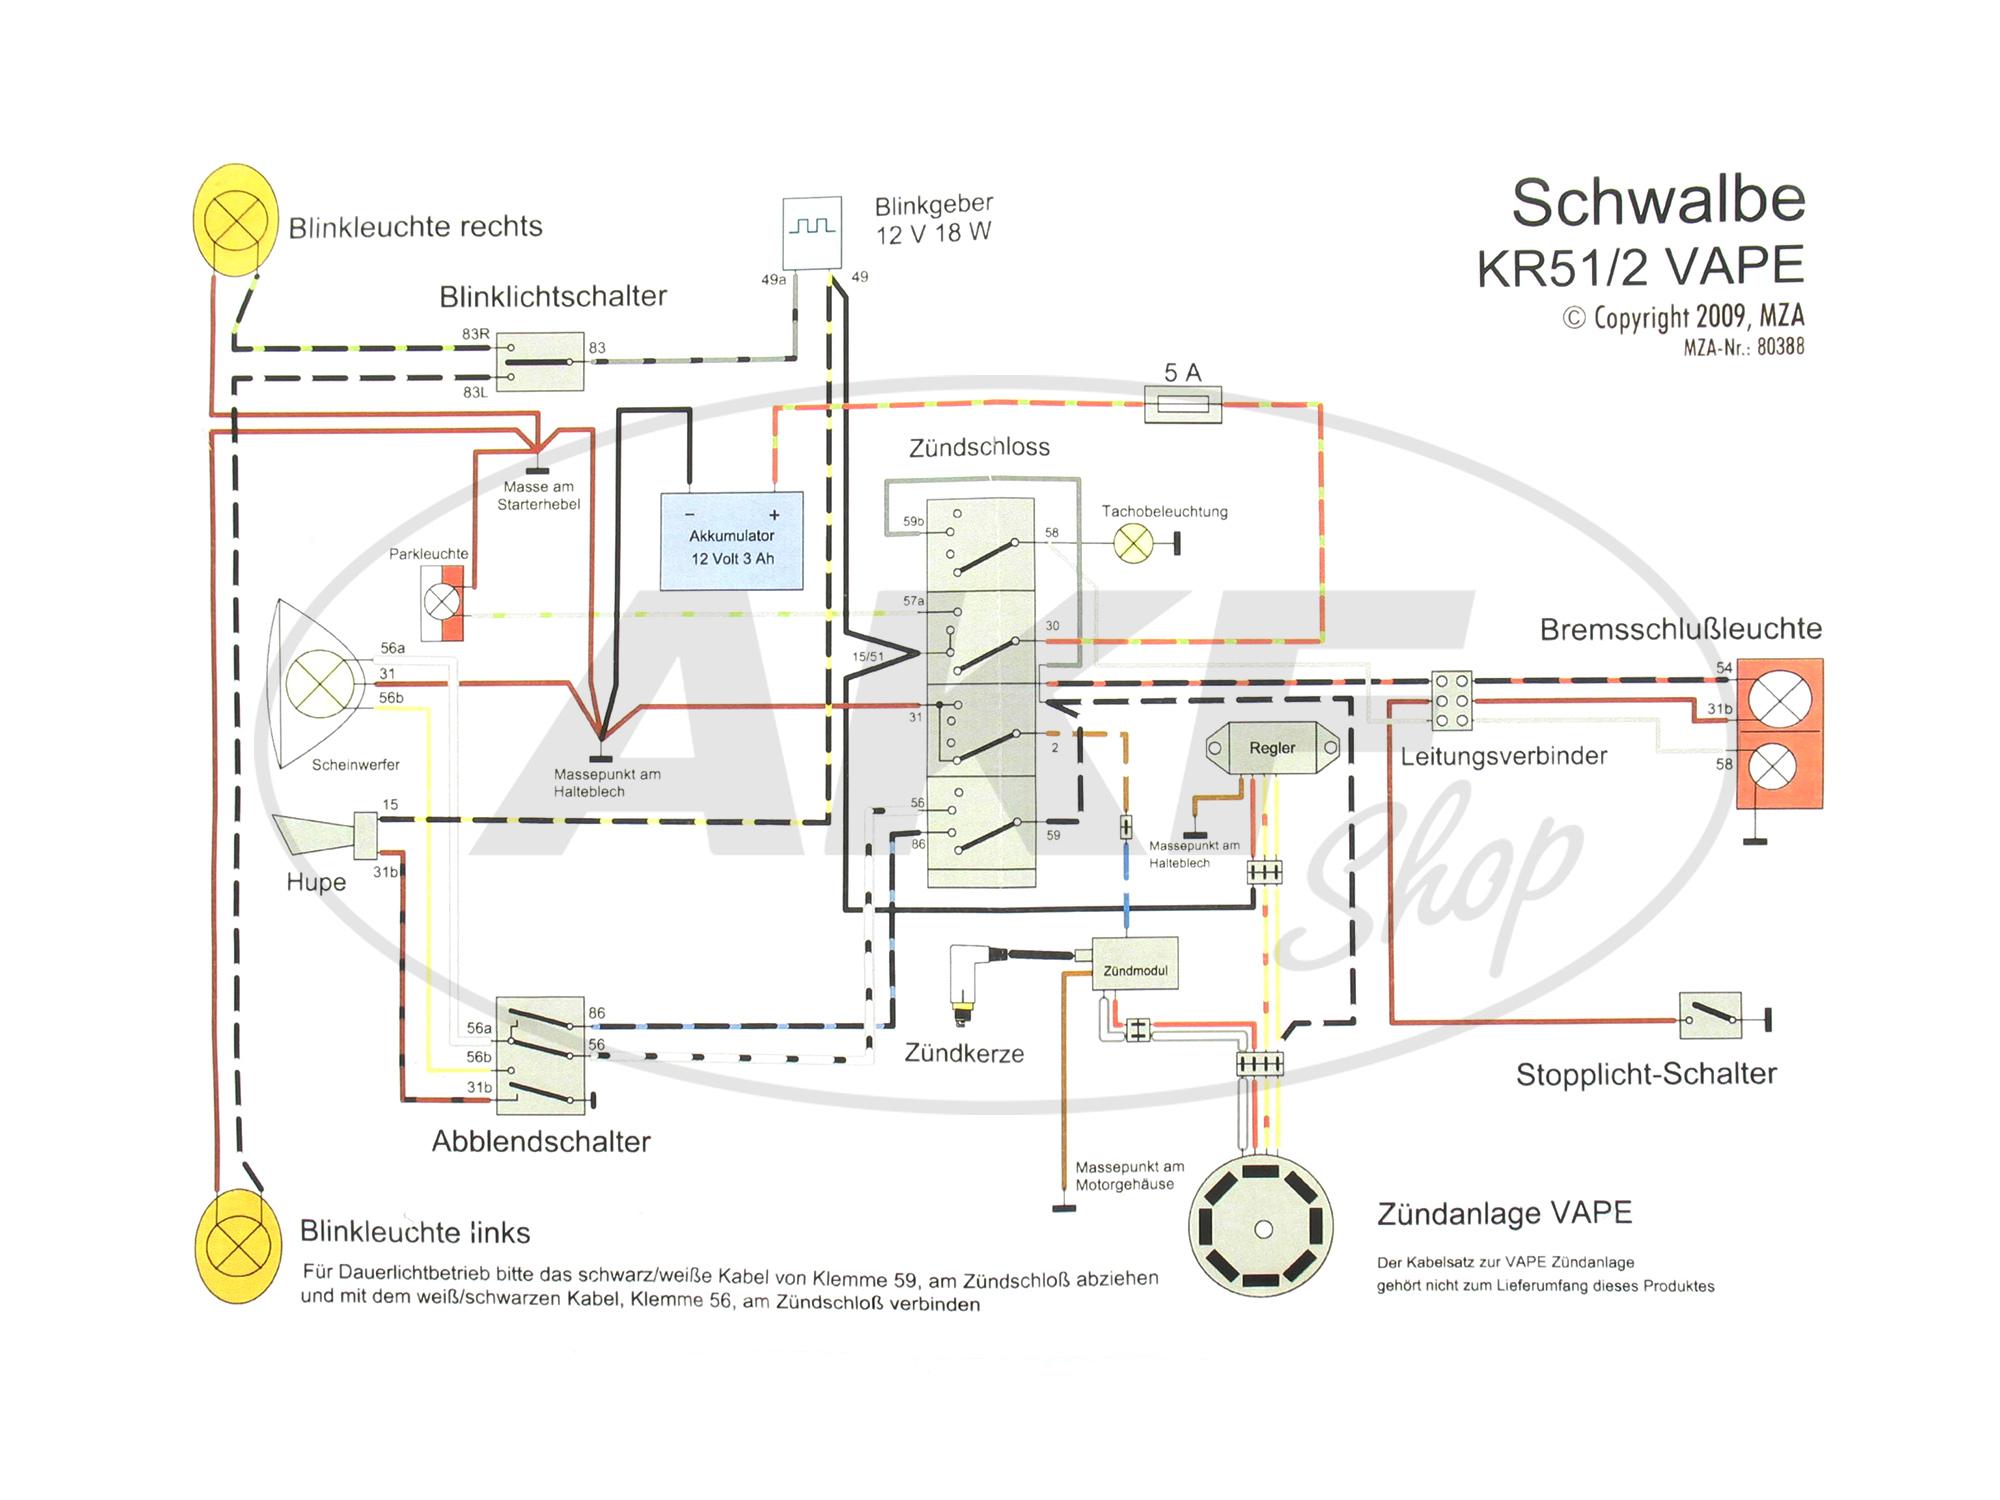 Wiring Harness Schwalbe Kr51 2 12v Vape With Diagram Schematics Image